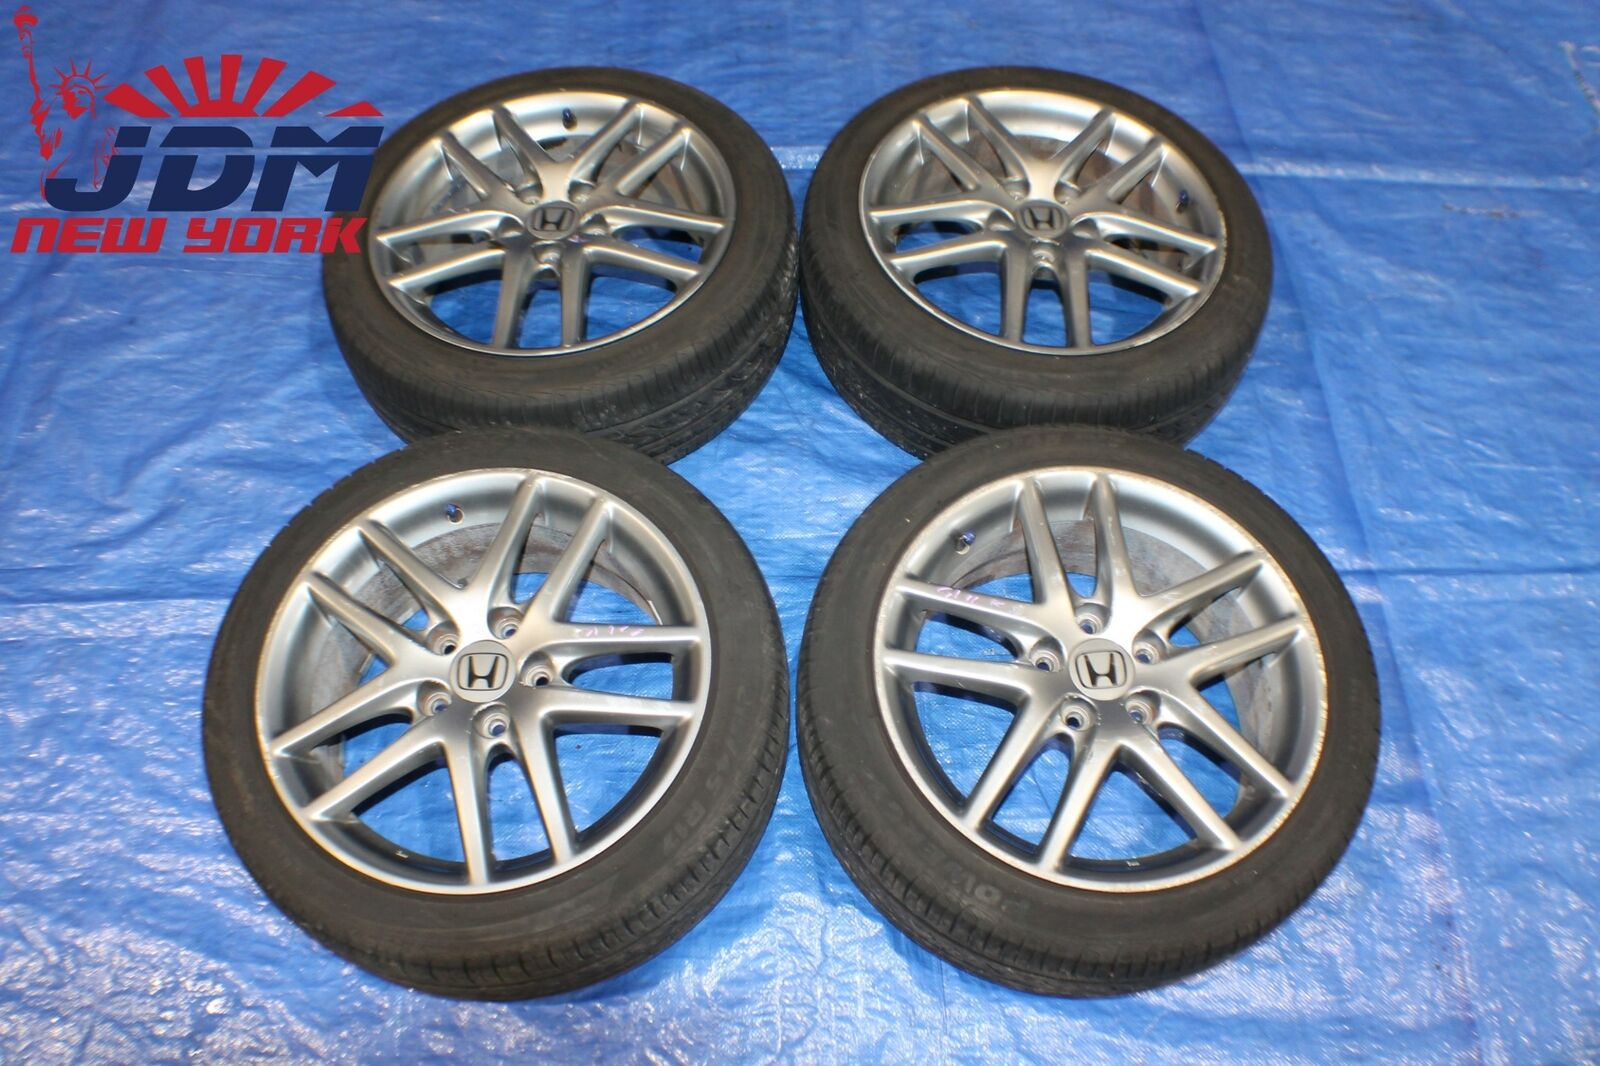 Jdm Honda Acura Integra Type R Dc5 Rsx 4 5x114 3 17x7 Jj Wheels Rims 215 45 R17 Jdm New York